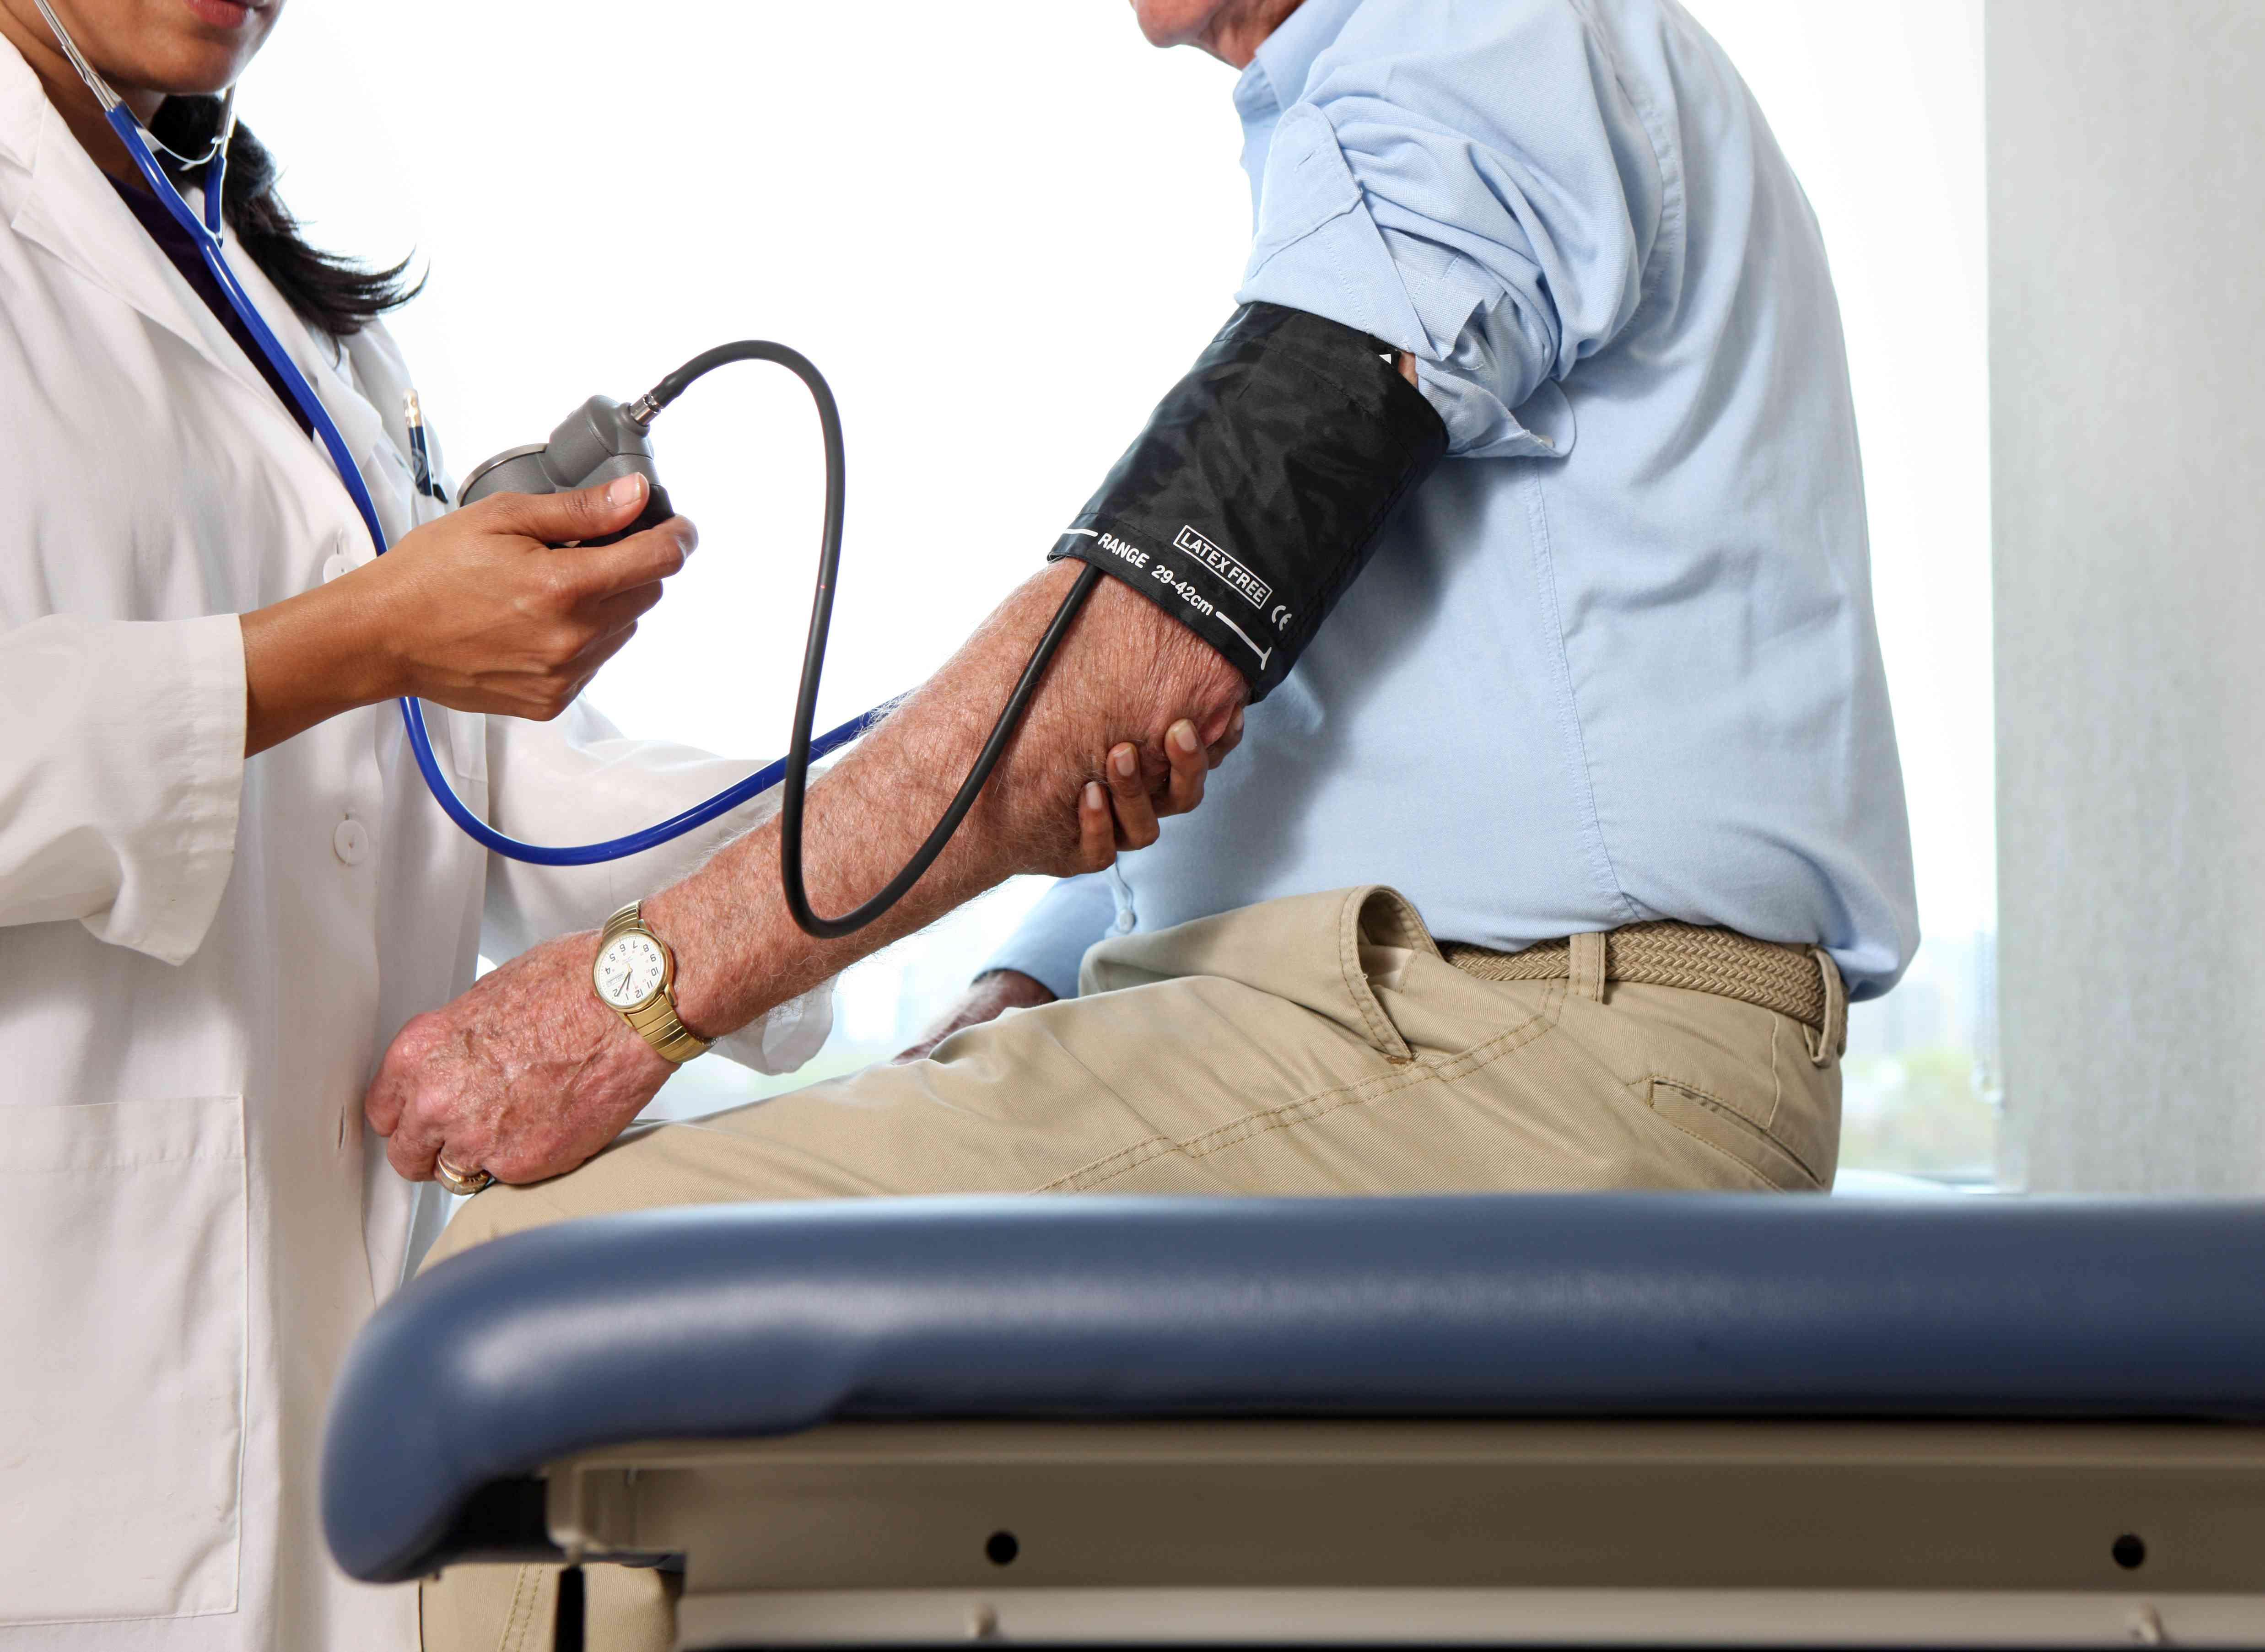 Doctor checks man's blood pressure.